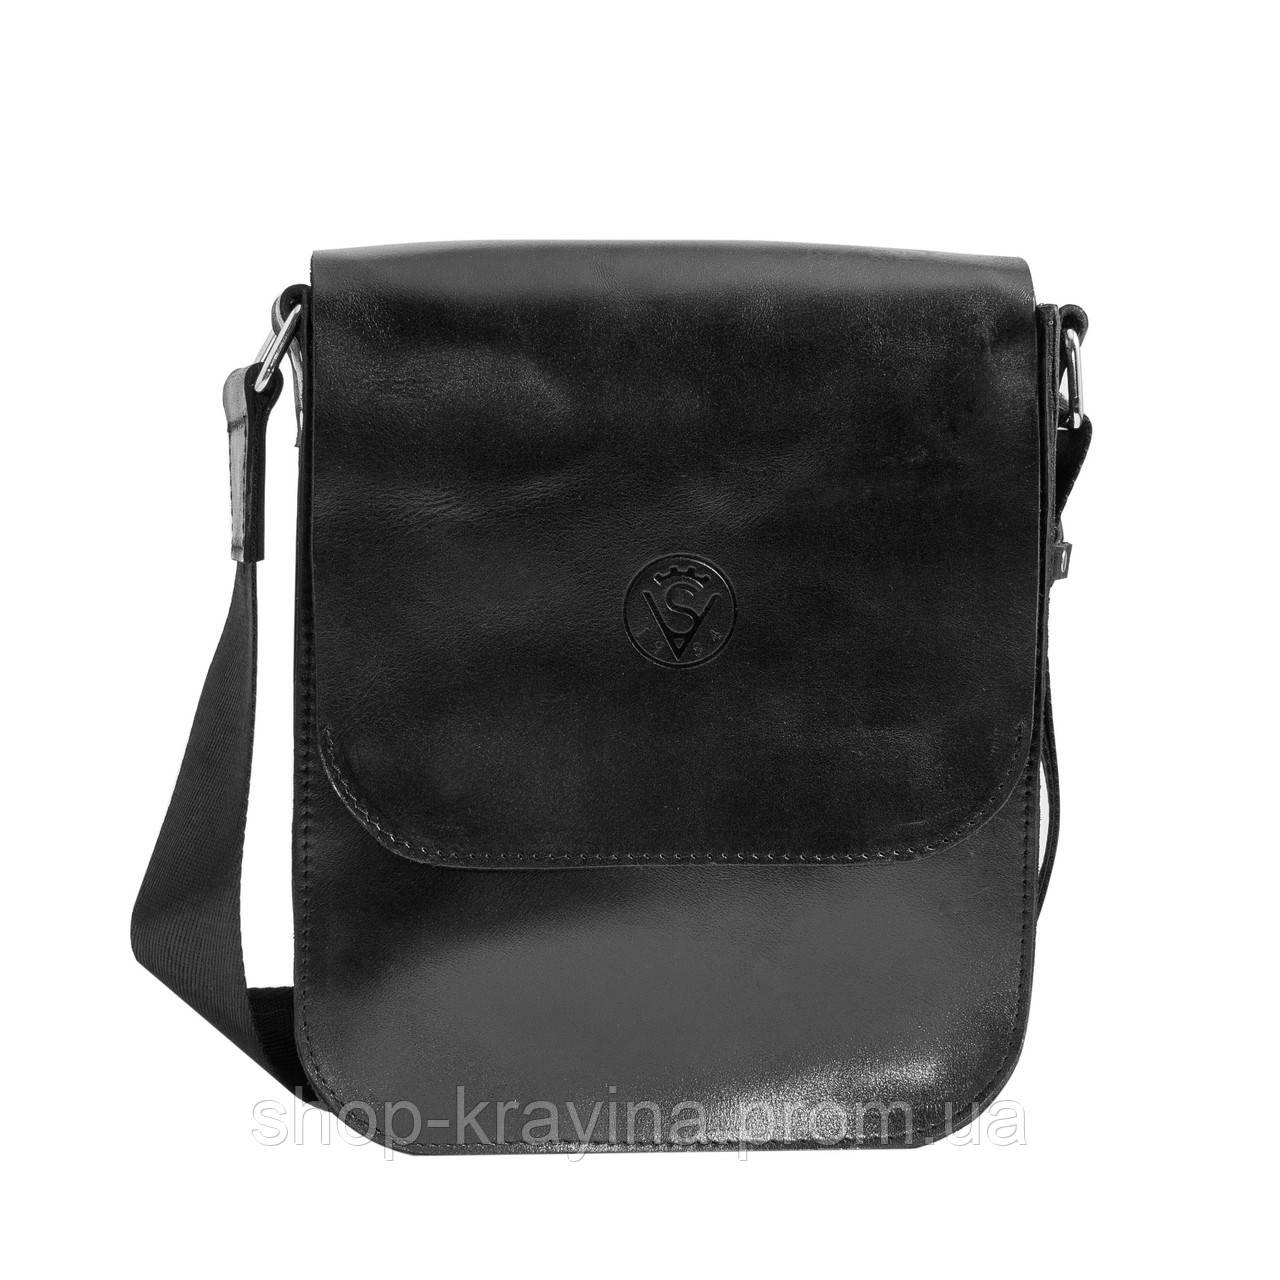 Кожаная мужская сумка VS214  black gloss 20х23х5.5  см